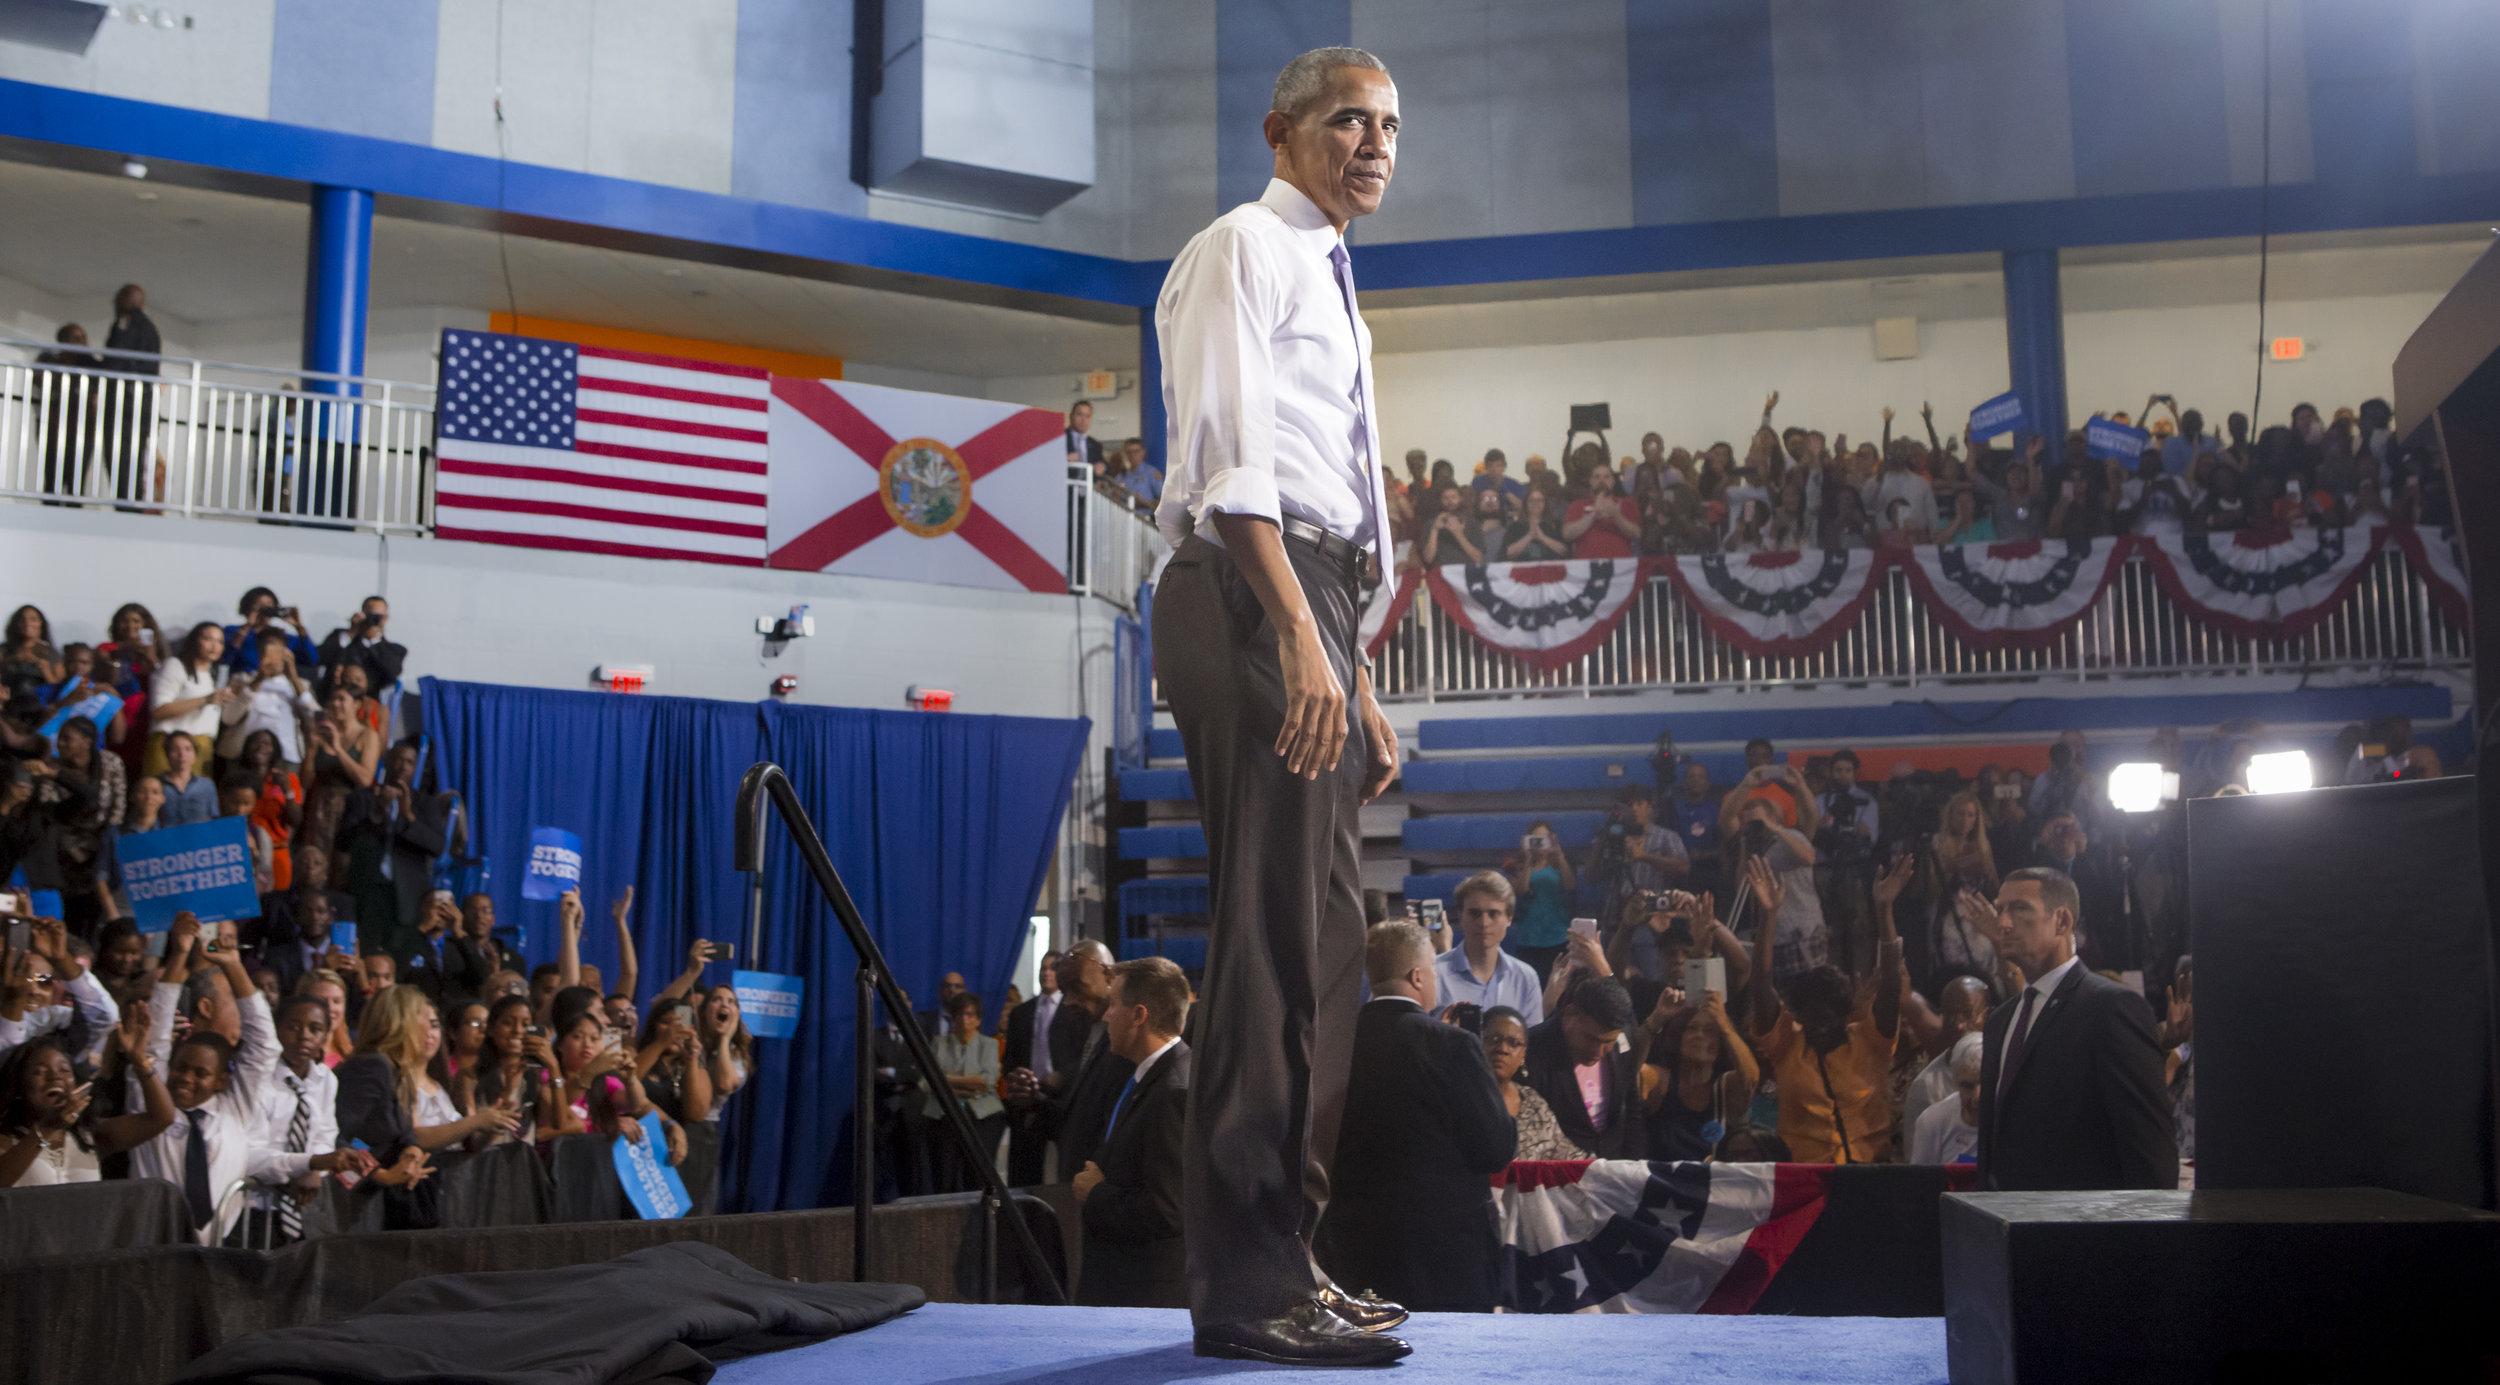 10202016_BJM_Barack_Obama_Campaigns_in_Miami_Florida_05.jpg